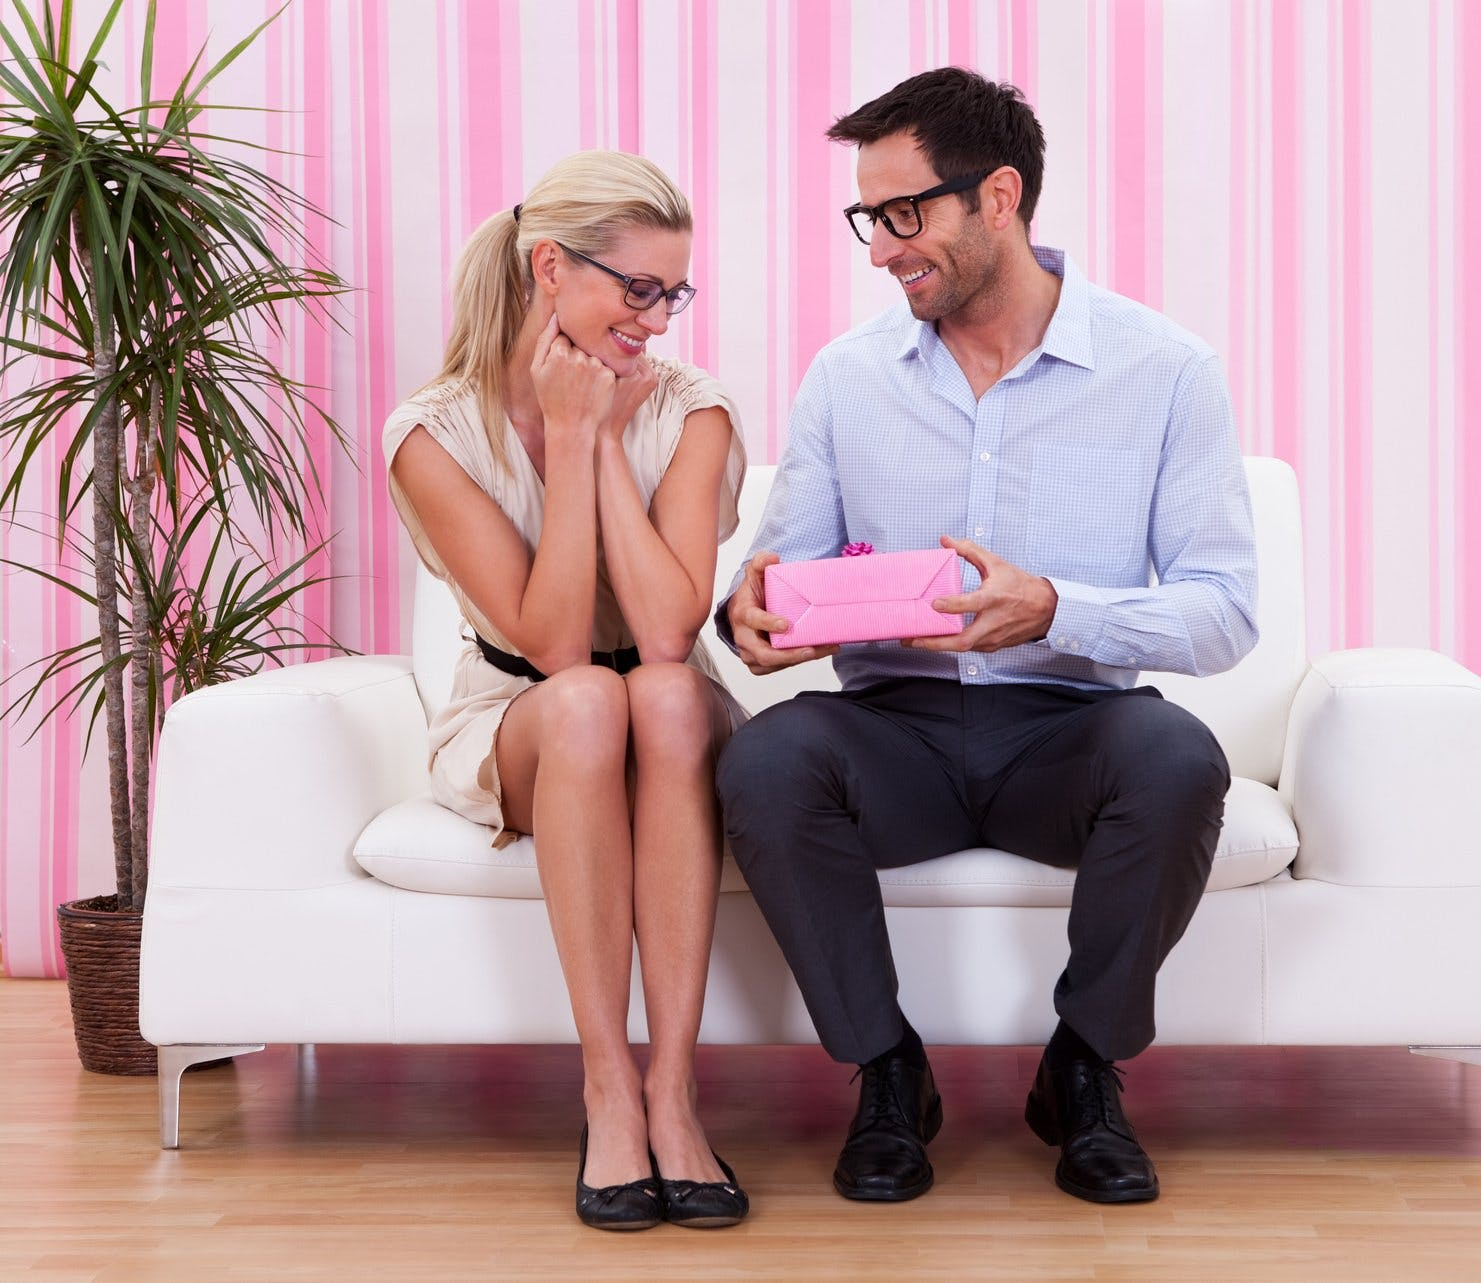 5 विचार रोमांस पुनर्जीवित करने के लिए